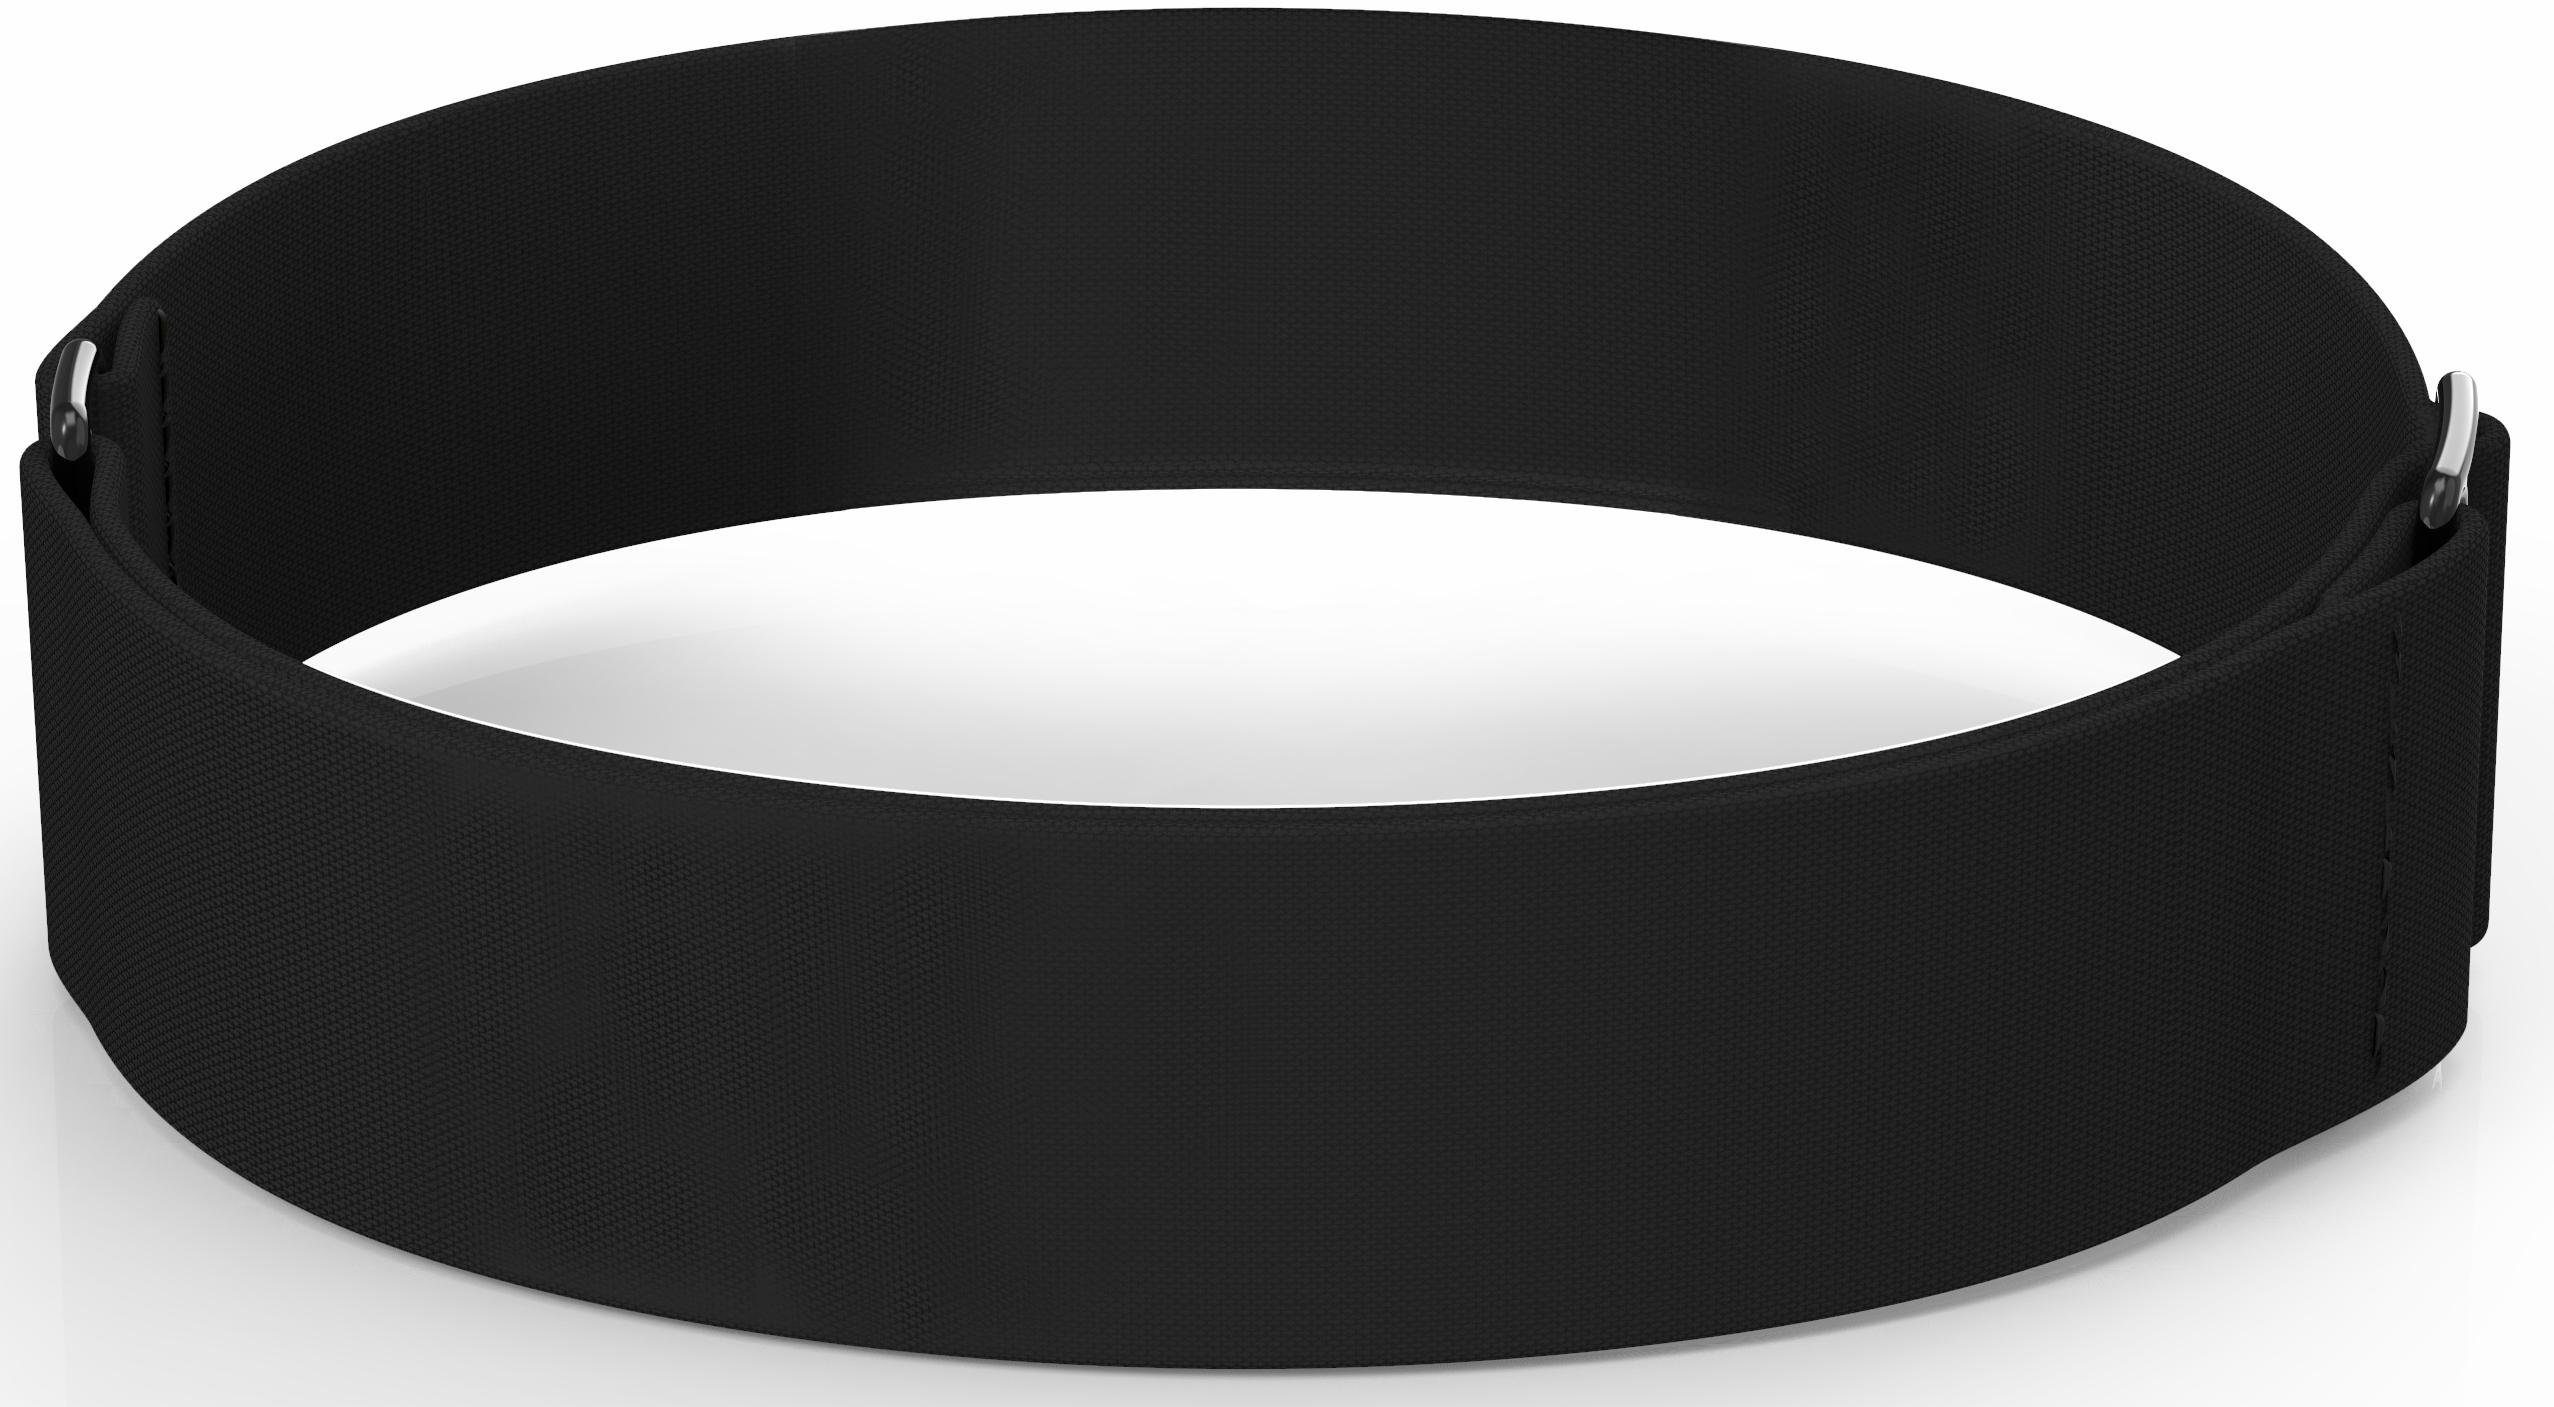 Polar Wechselarmband, schwarz, »OH 1 Armband«